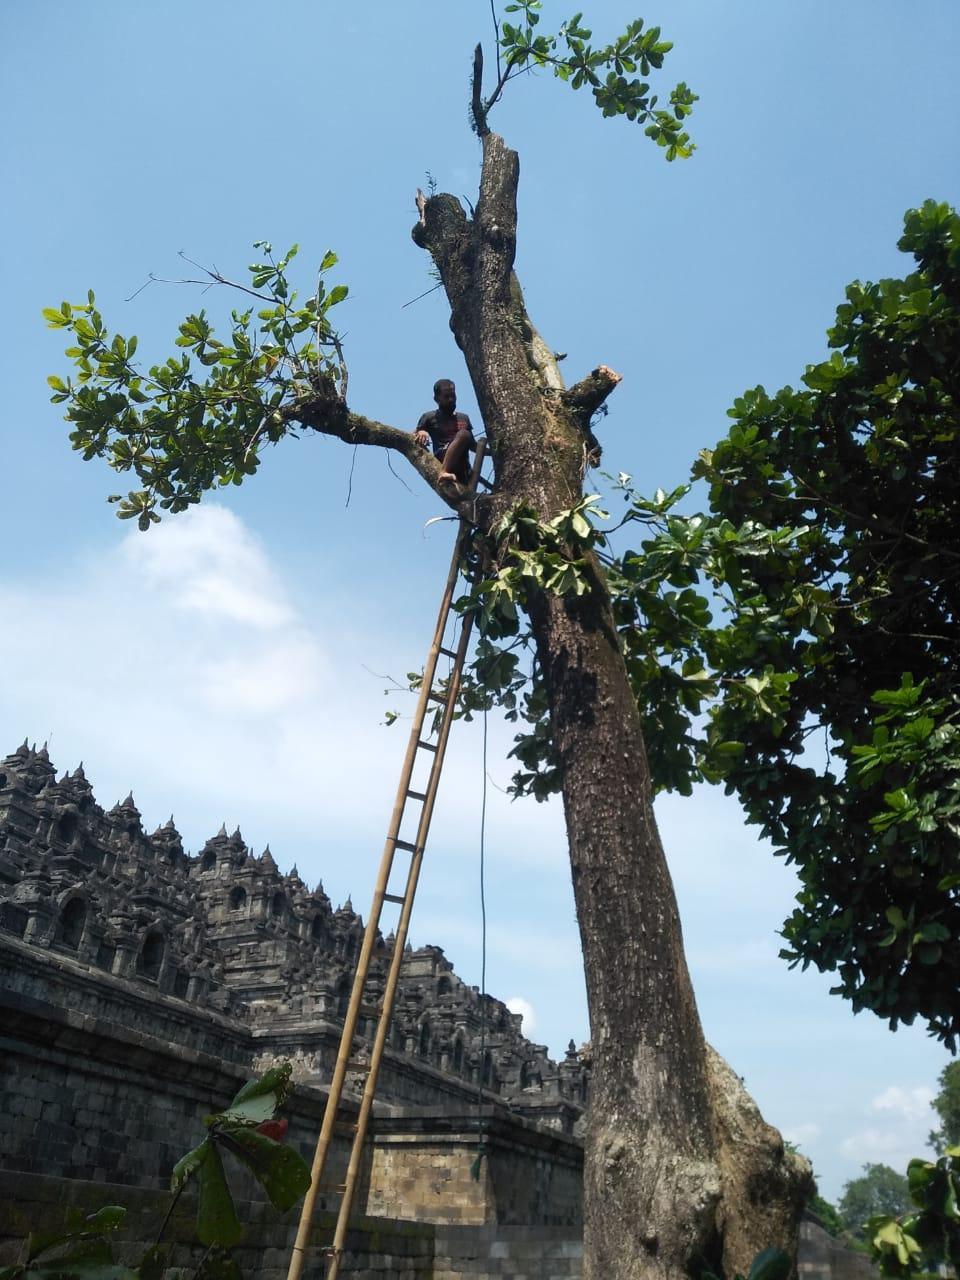 Pemangkasan pohon ketapang halaman sisi timur laut Candi Borobudur